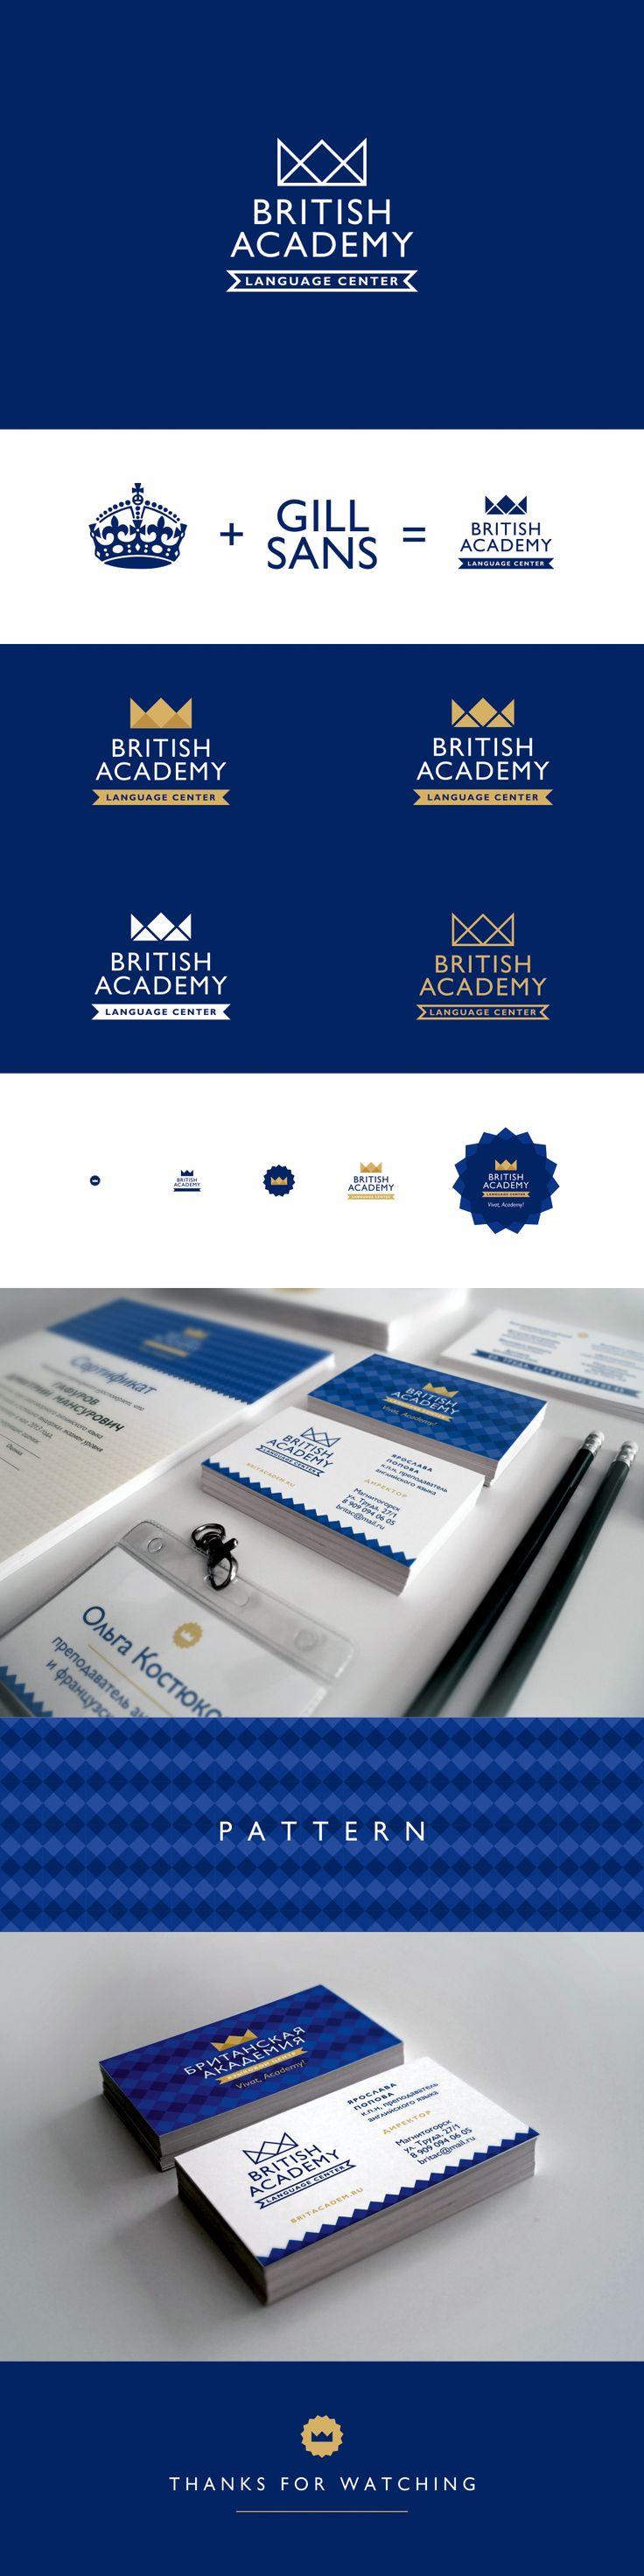 British Academy. Language Center on Behance